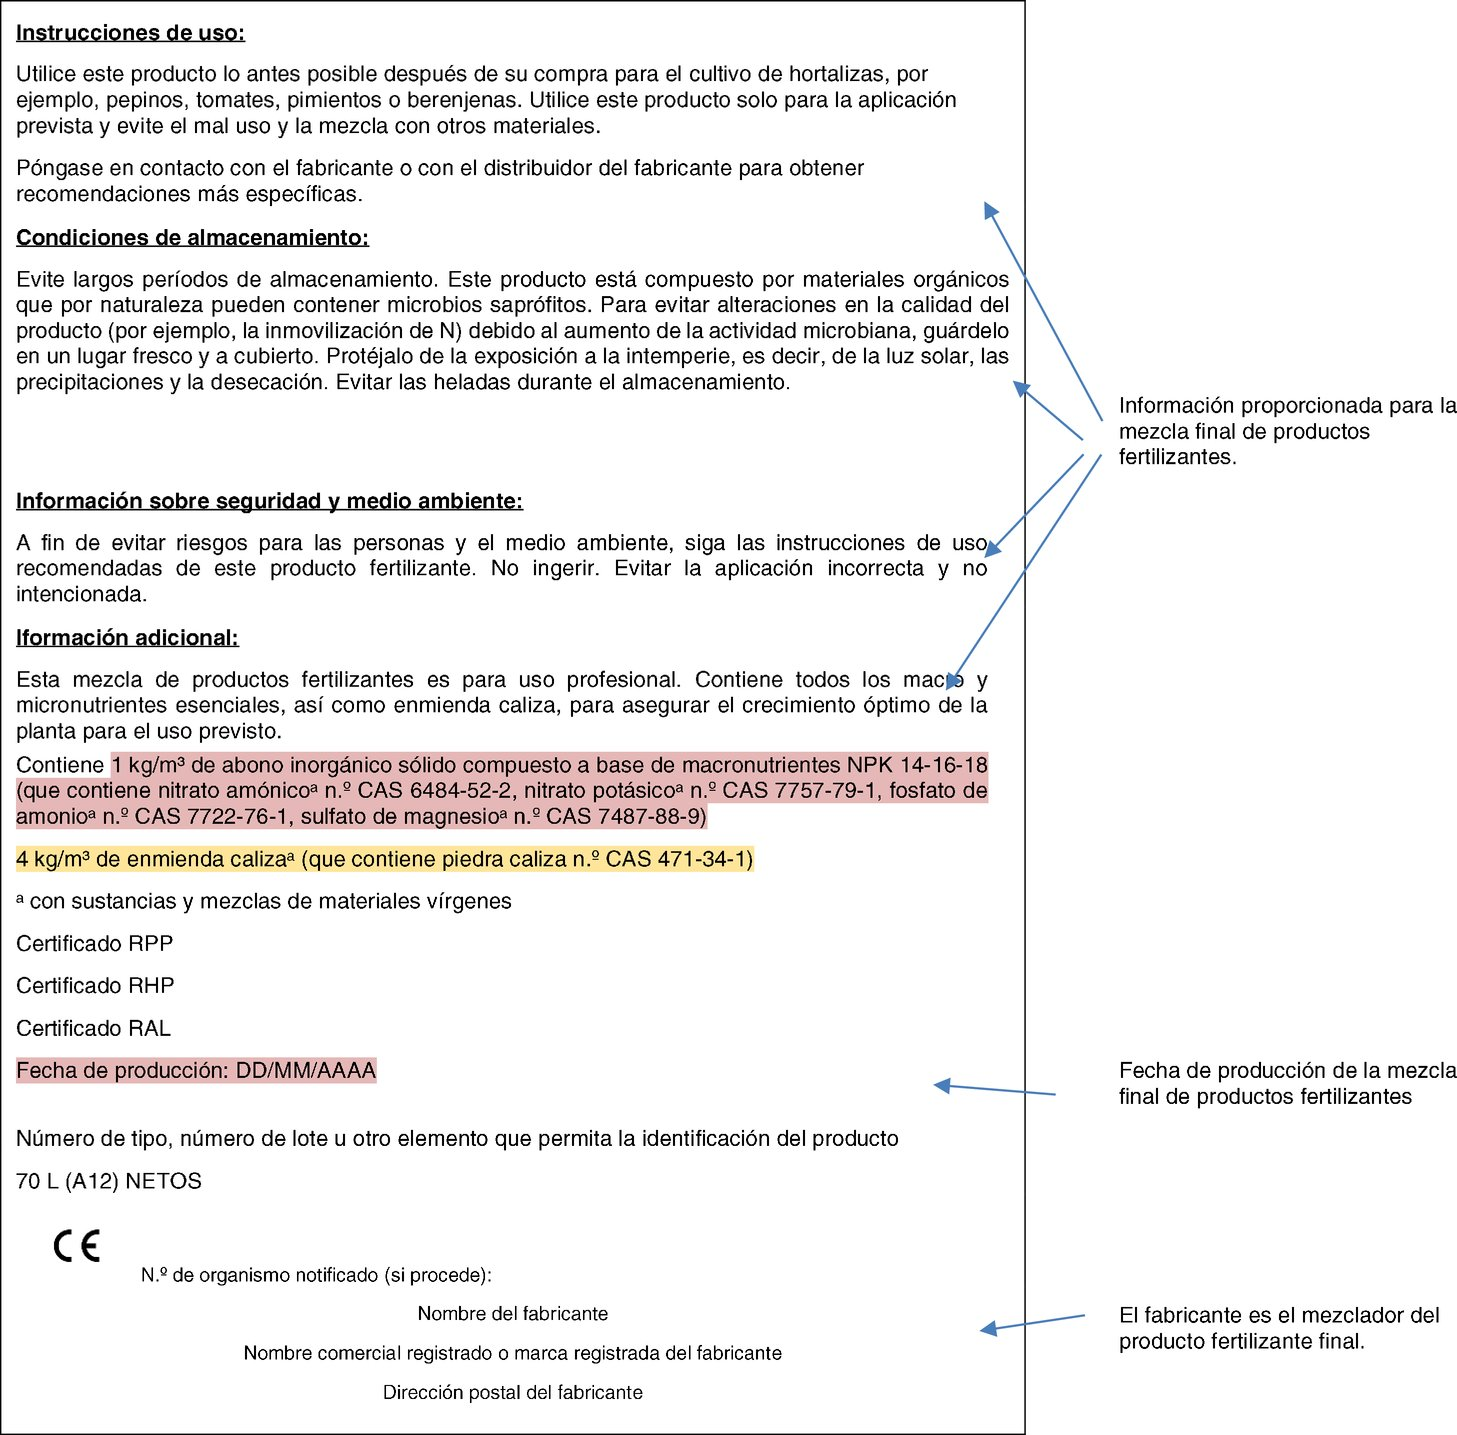 Imagen: http://publications.europa.eu/resource/uriserv/OJ.C_.2021.119.01.0001.01.SPA.xhtml.C_2021119ES.01004101.tif.jpg